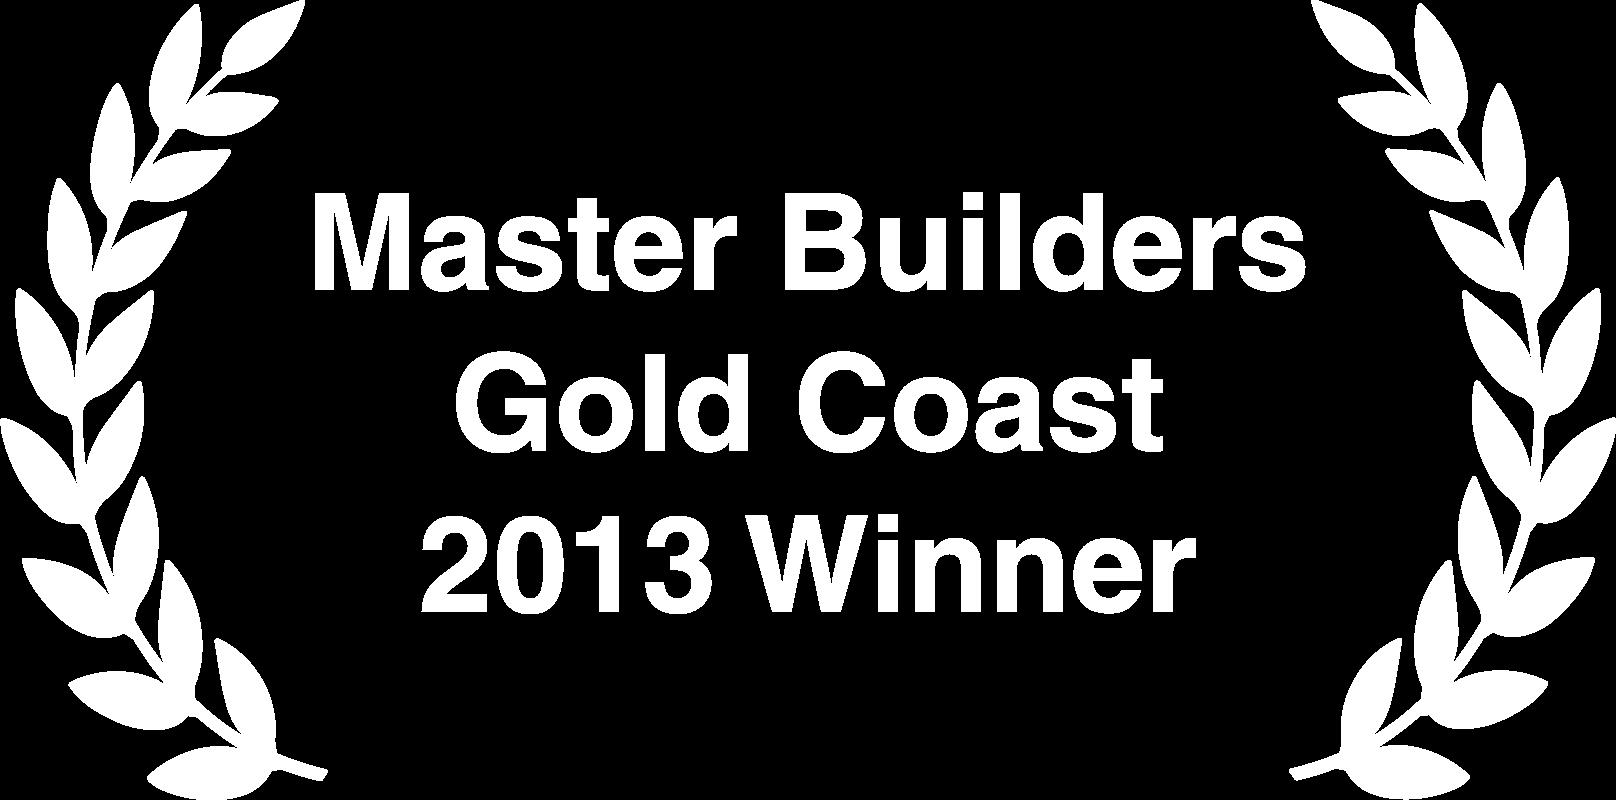 Master Builders Gold Coast 2013 Winner